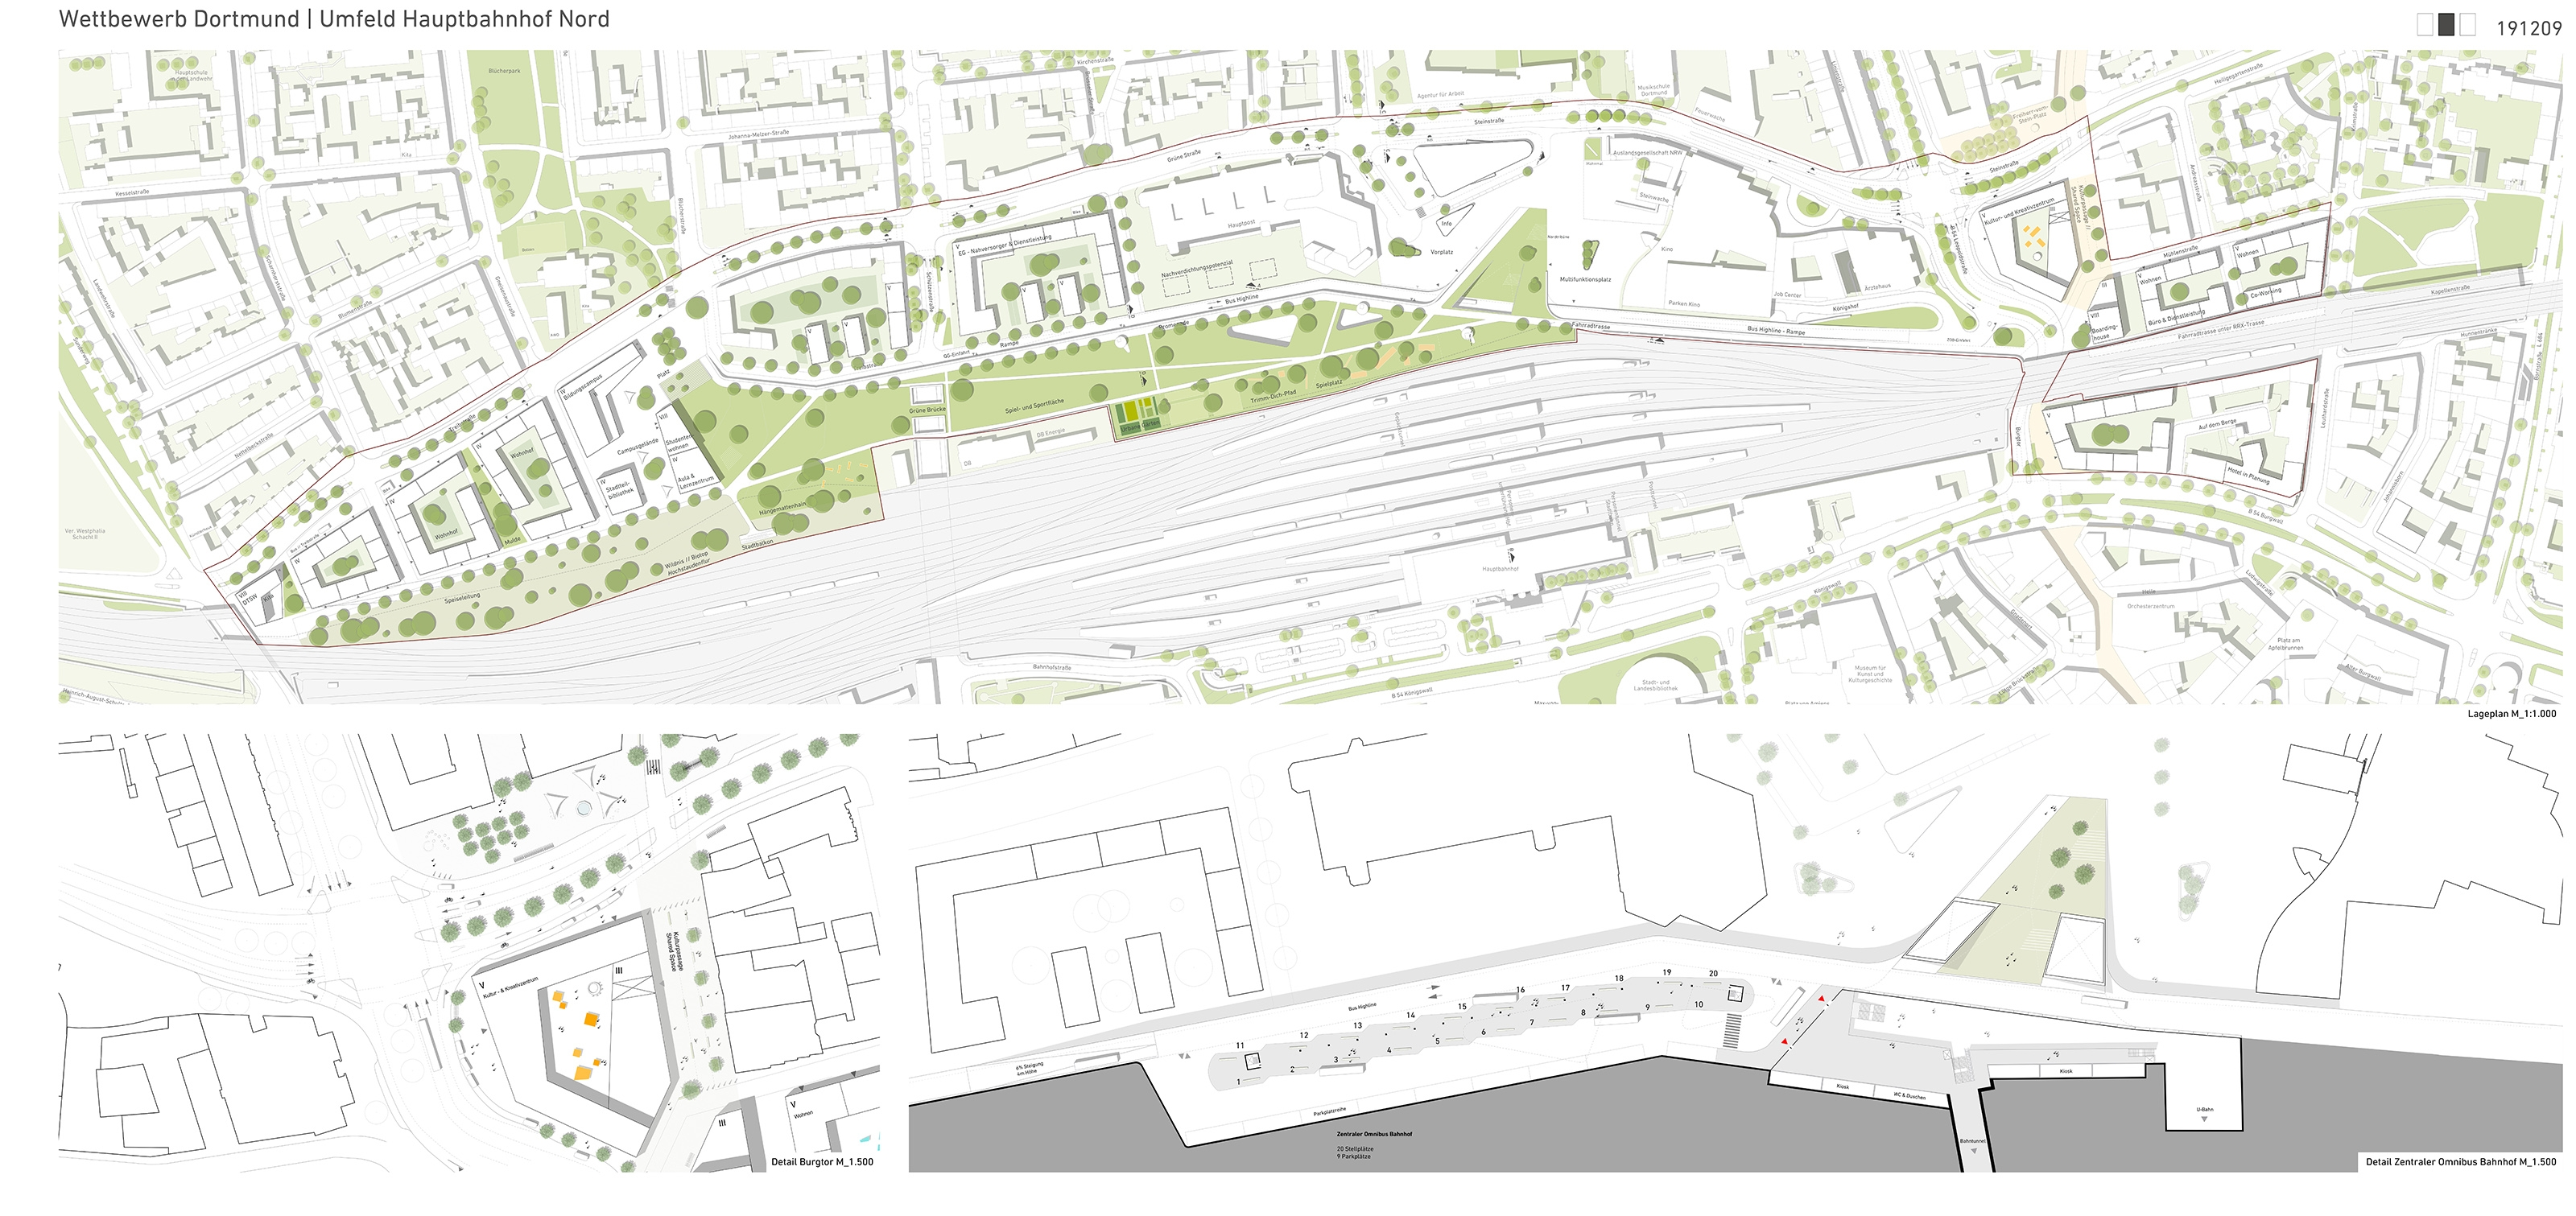 Ergebnis Umfeld Hauptbahnhof Nordcompetitionline